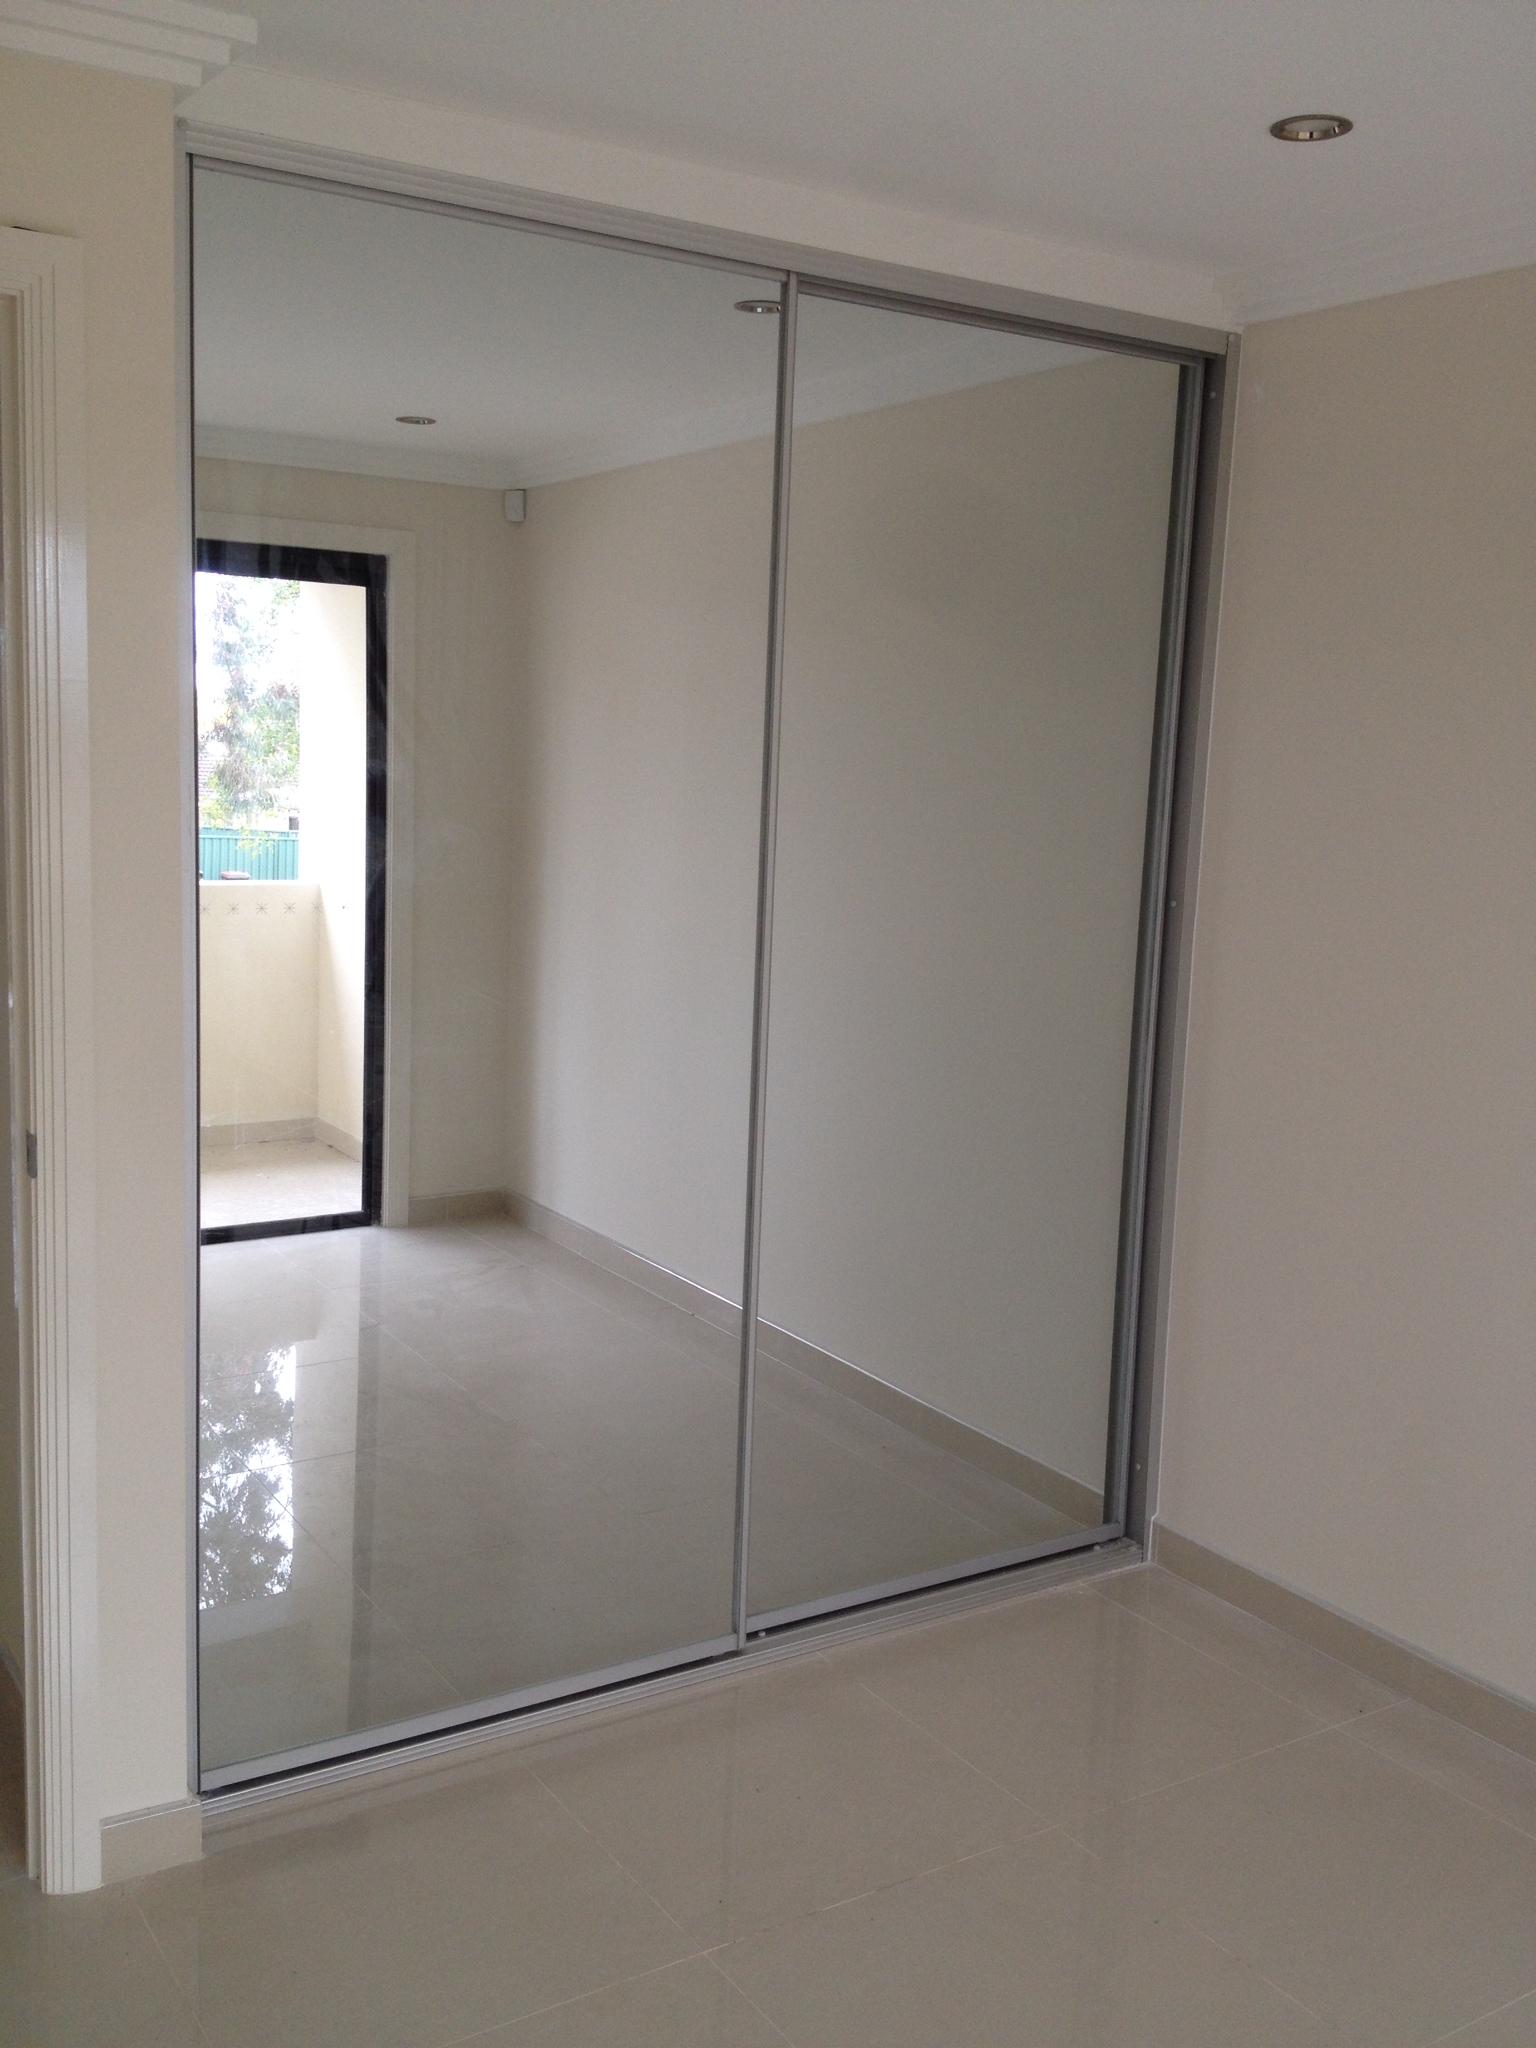 mirror sliding doors with matte silver frame.JPG